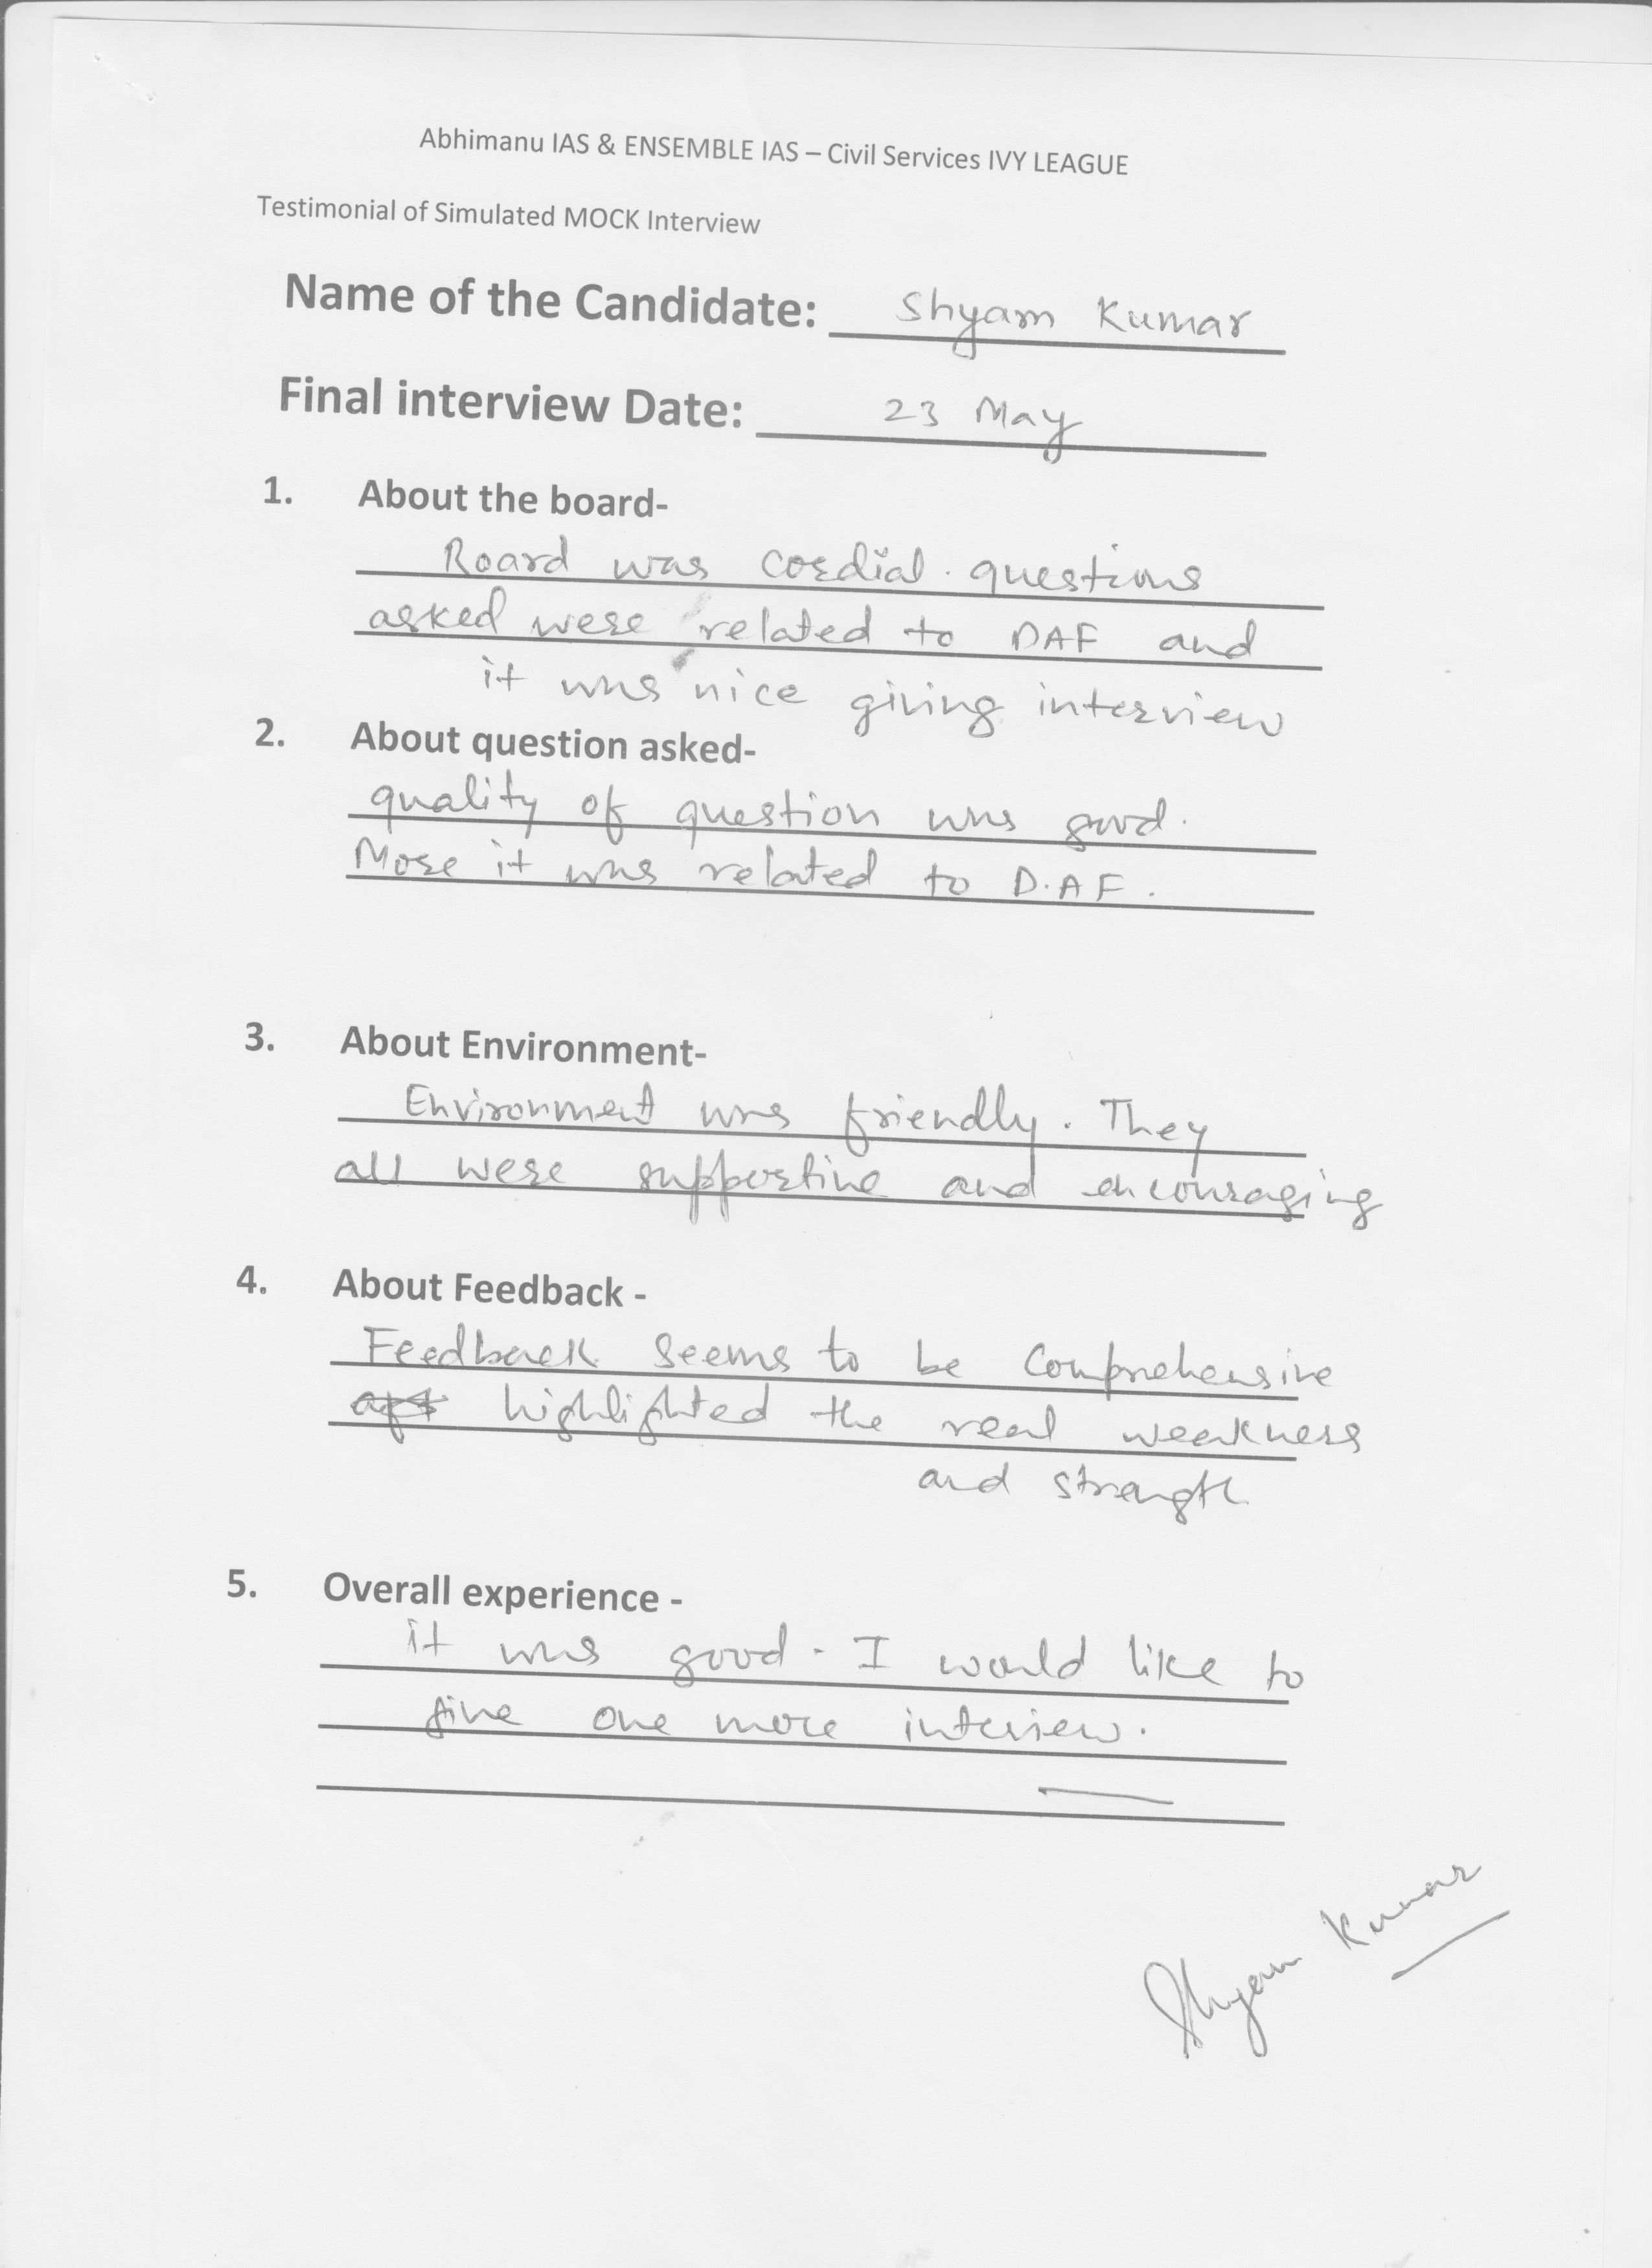 Interview Testimonial By- Shyam Kumar